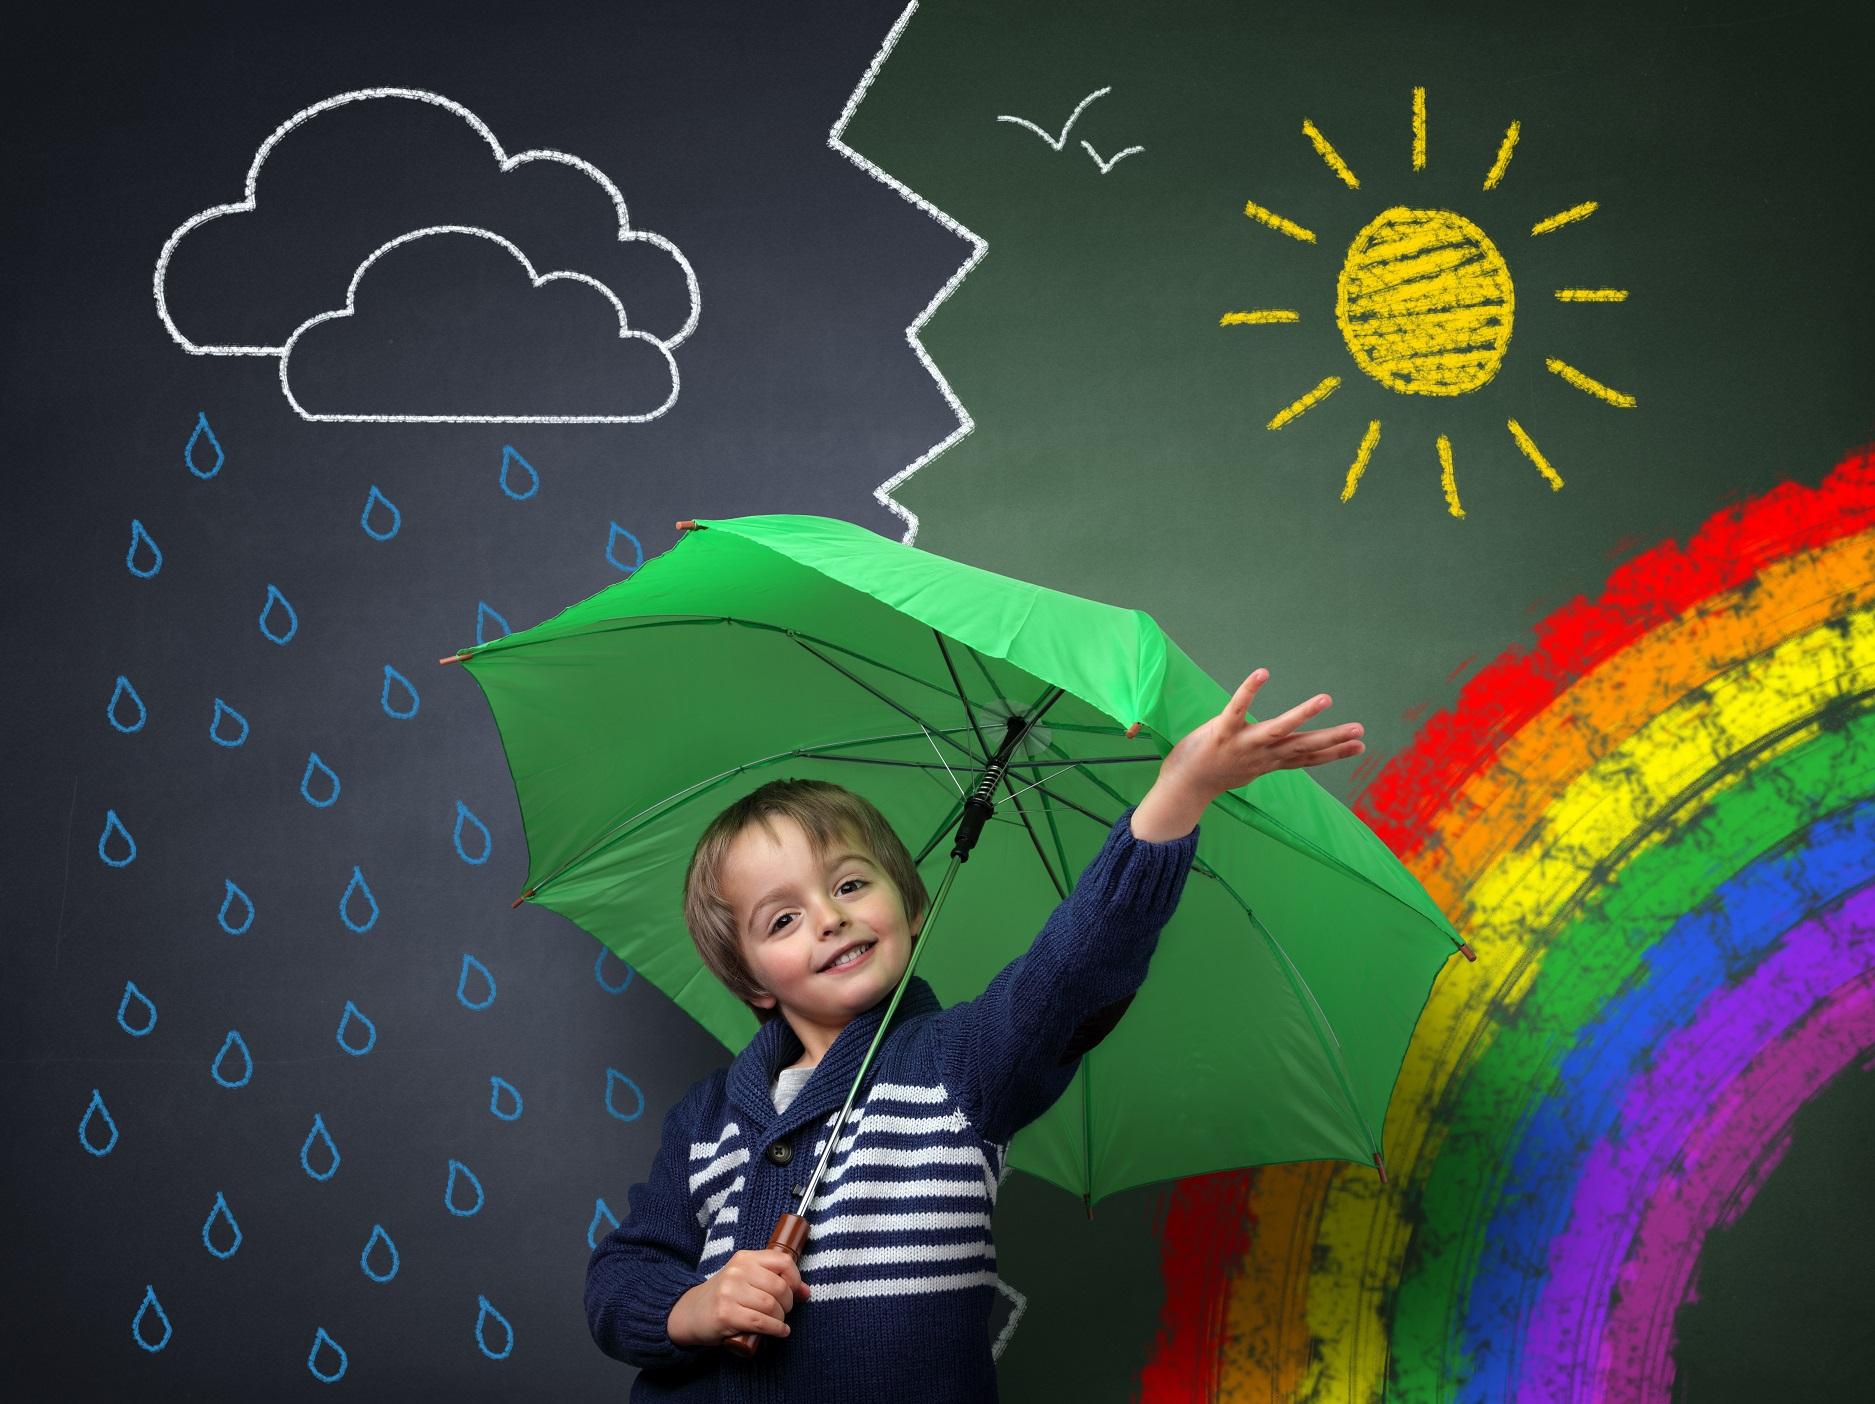 Rainy weather, rainbow, open